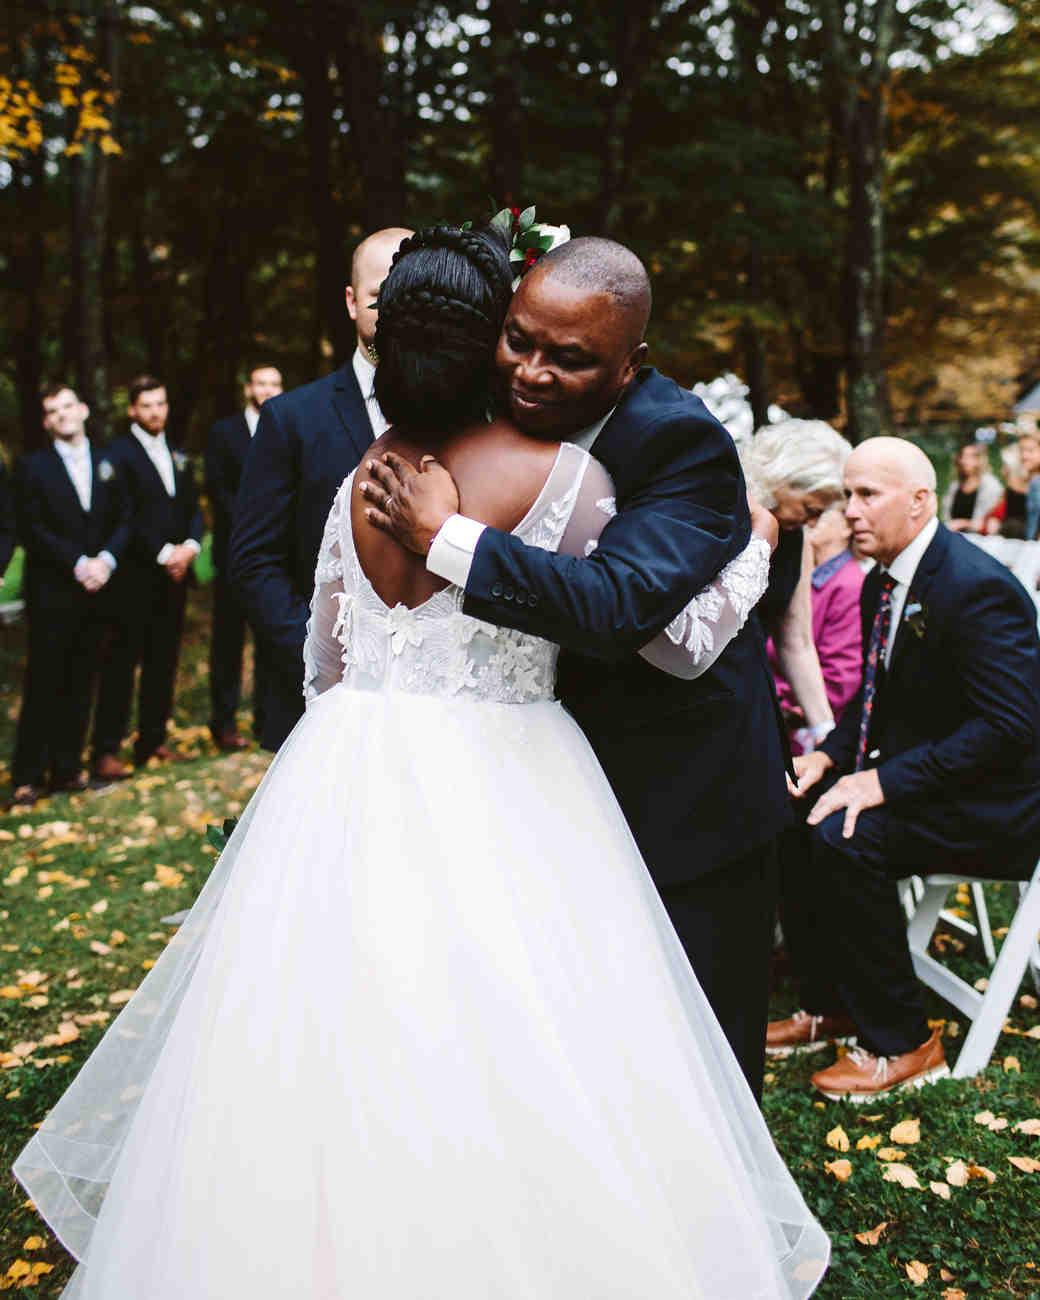 rivka aaron wedding father bride hugging